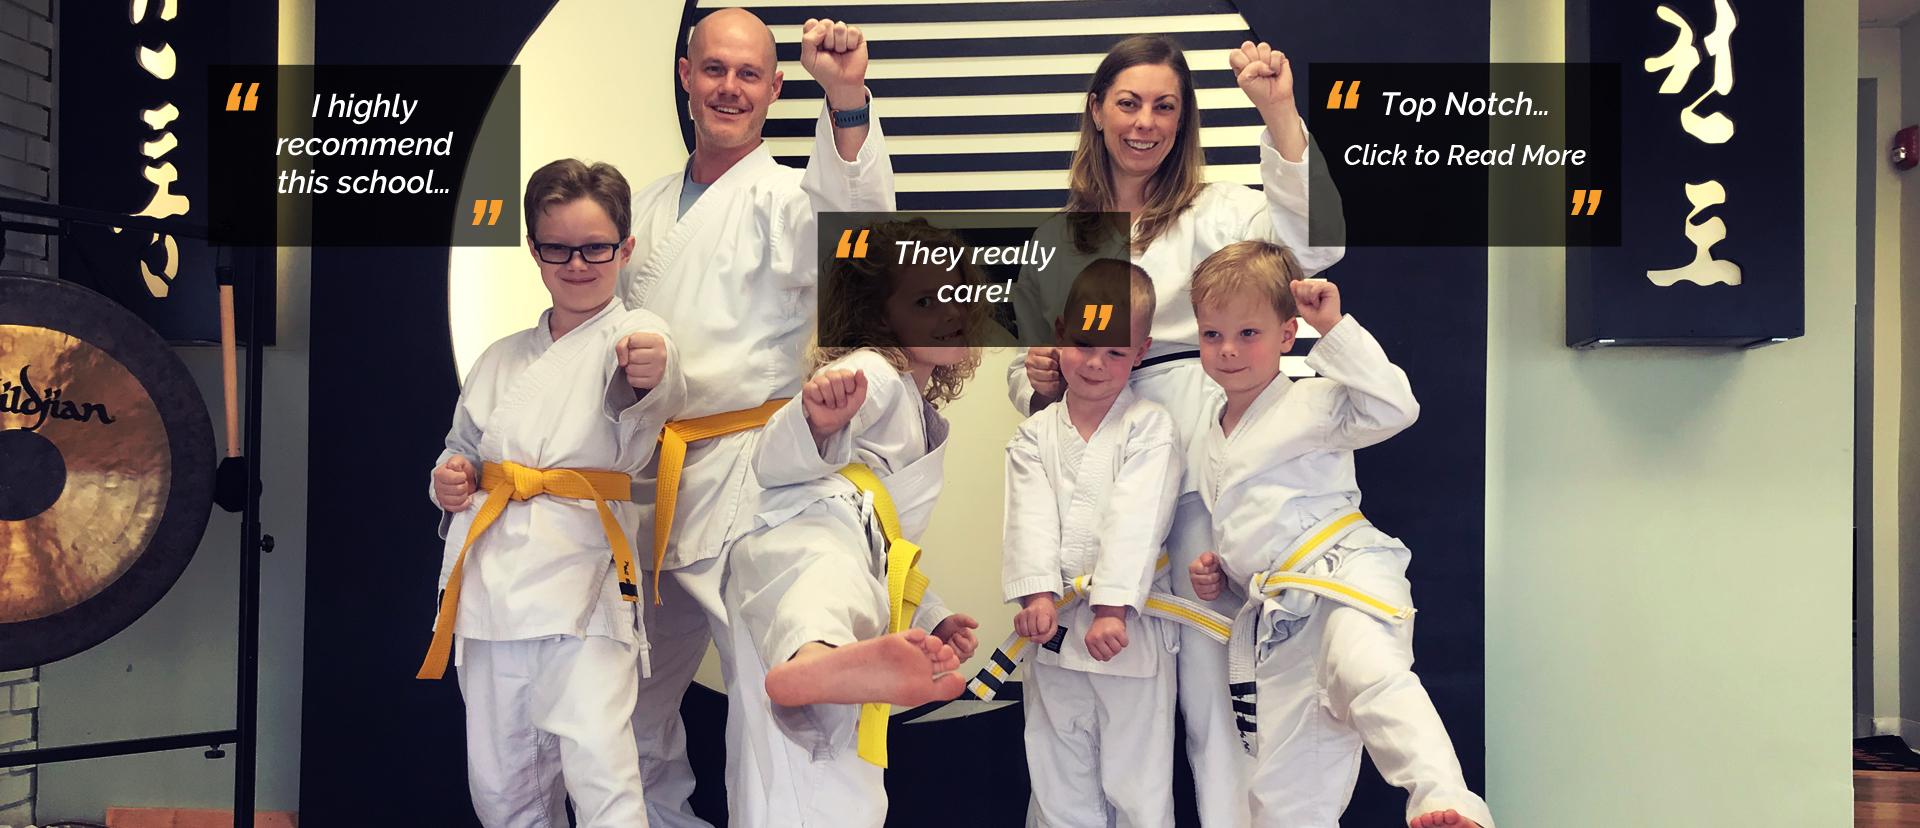 Taekwondo-Slider-Testimonial